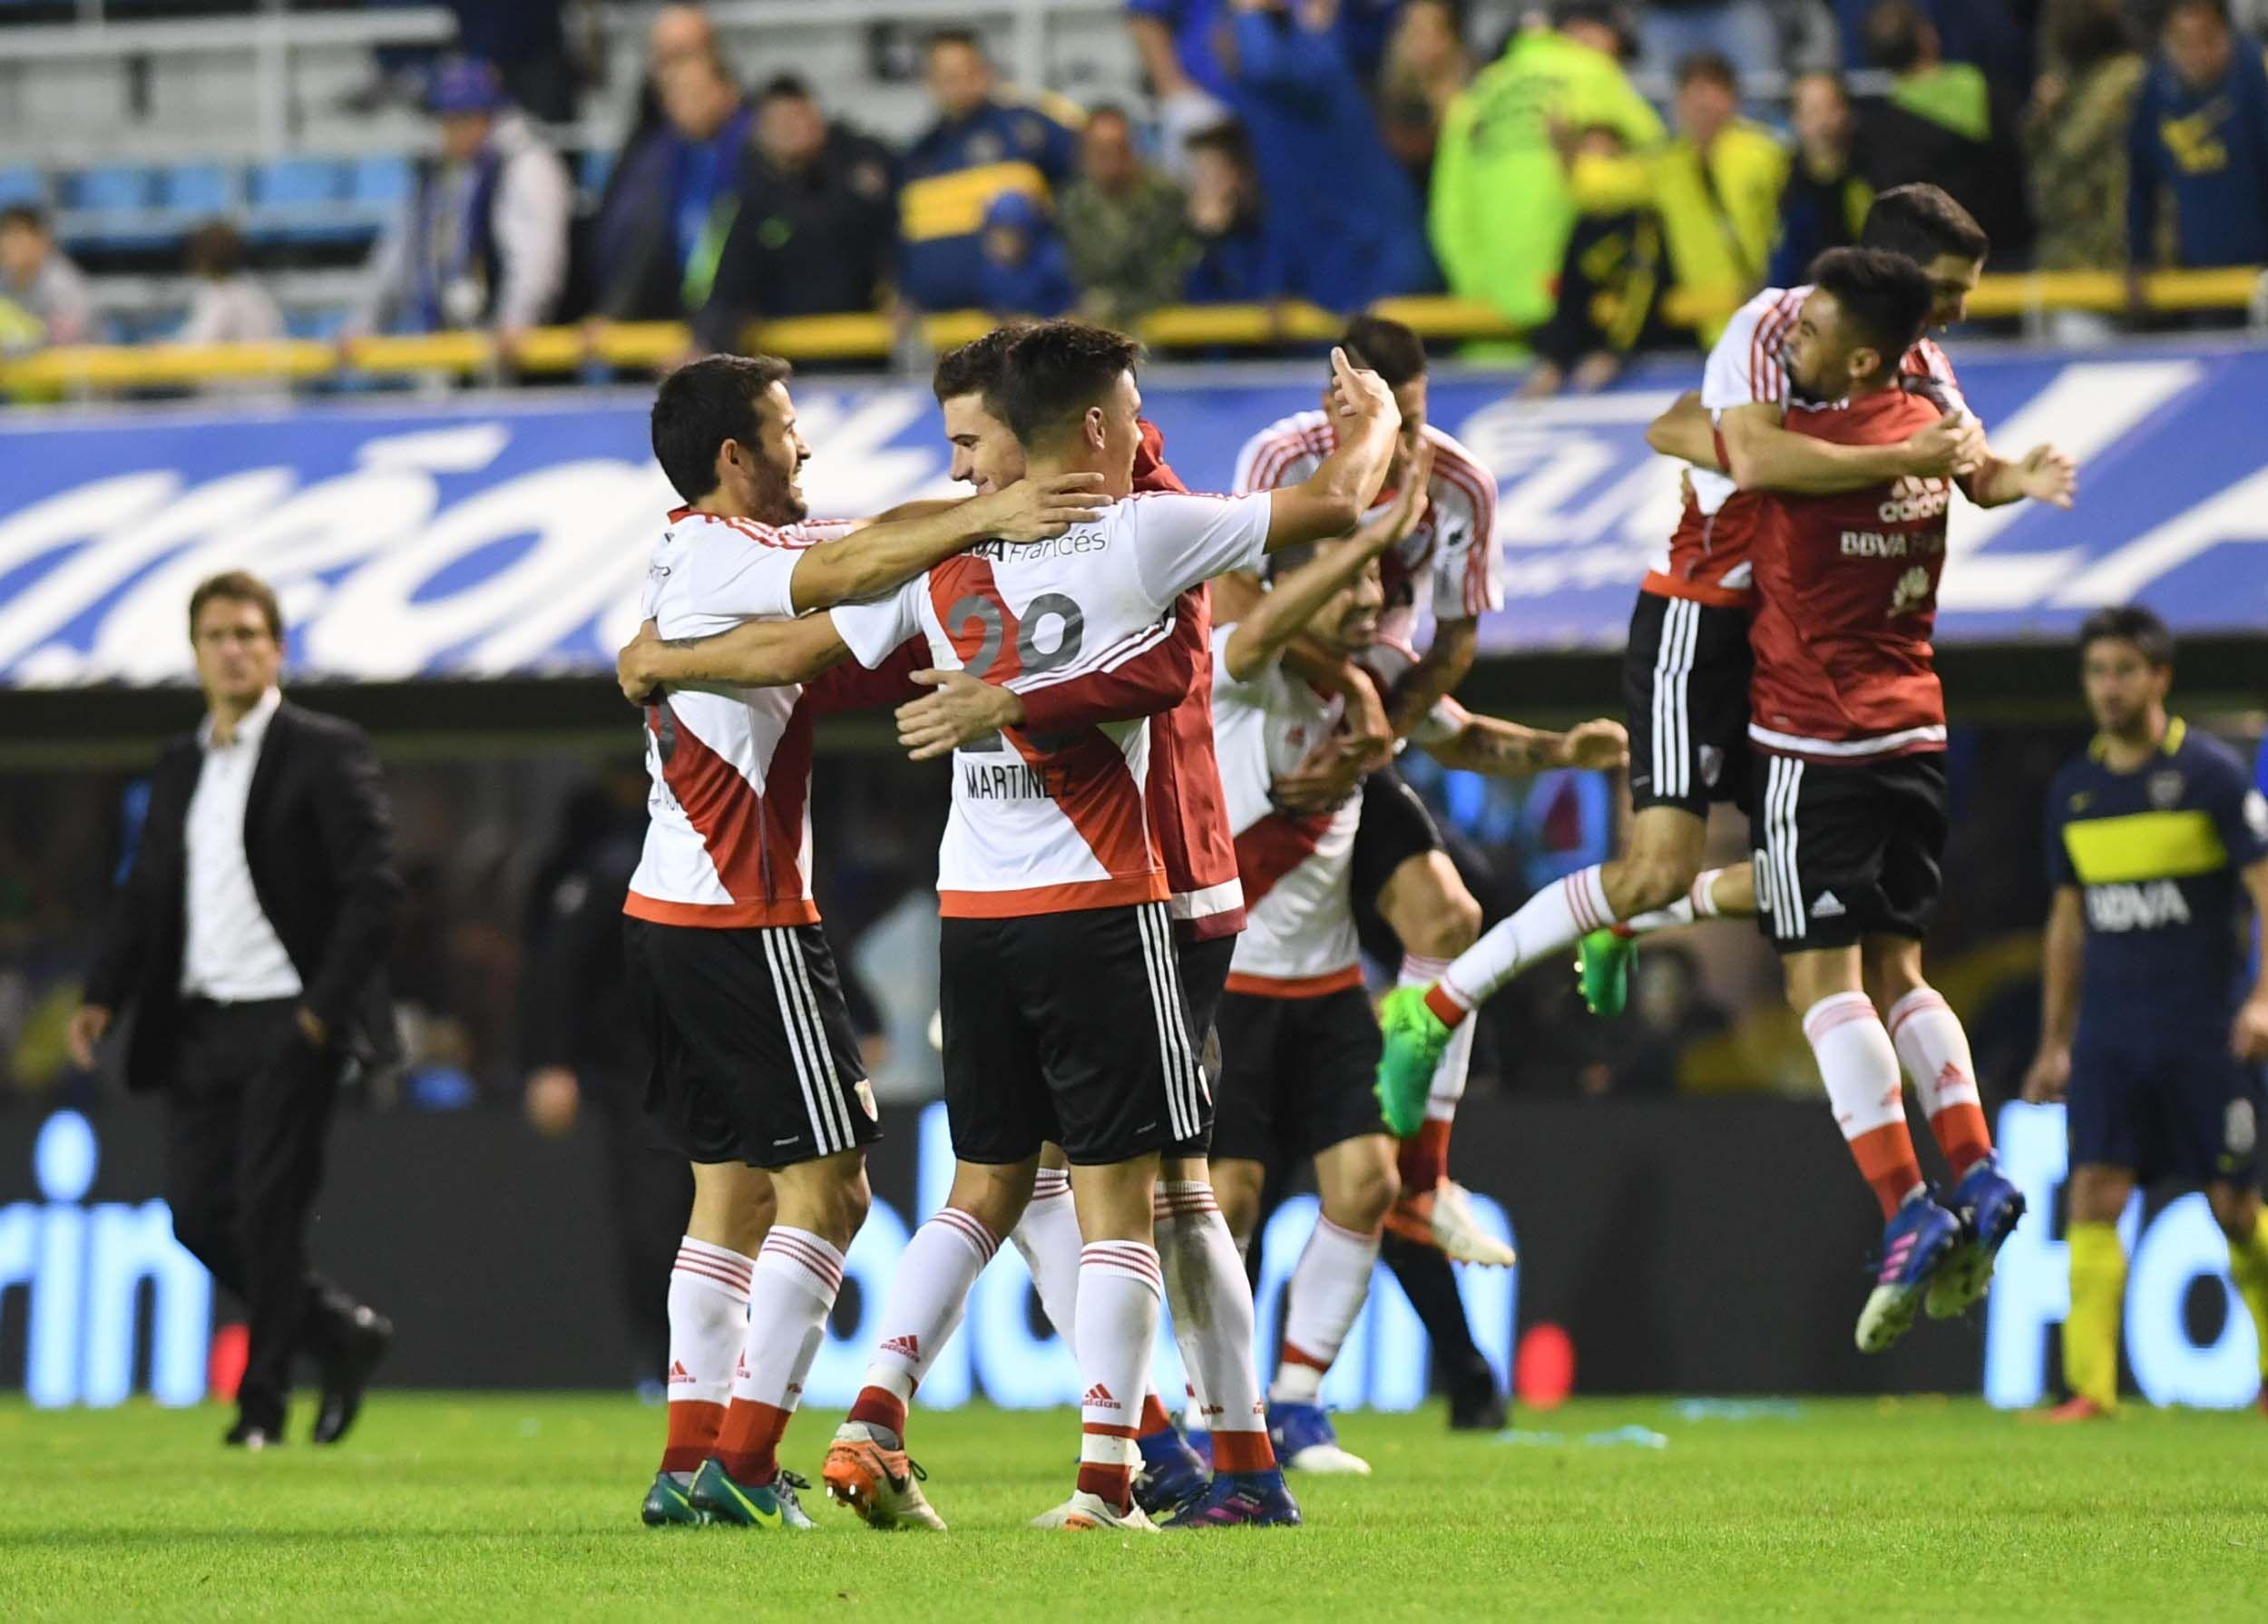 Los jugadores de River festejan el final del Superclásico en el que superaron a Boca por 3 a 1.